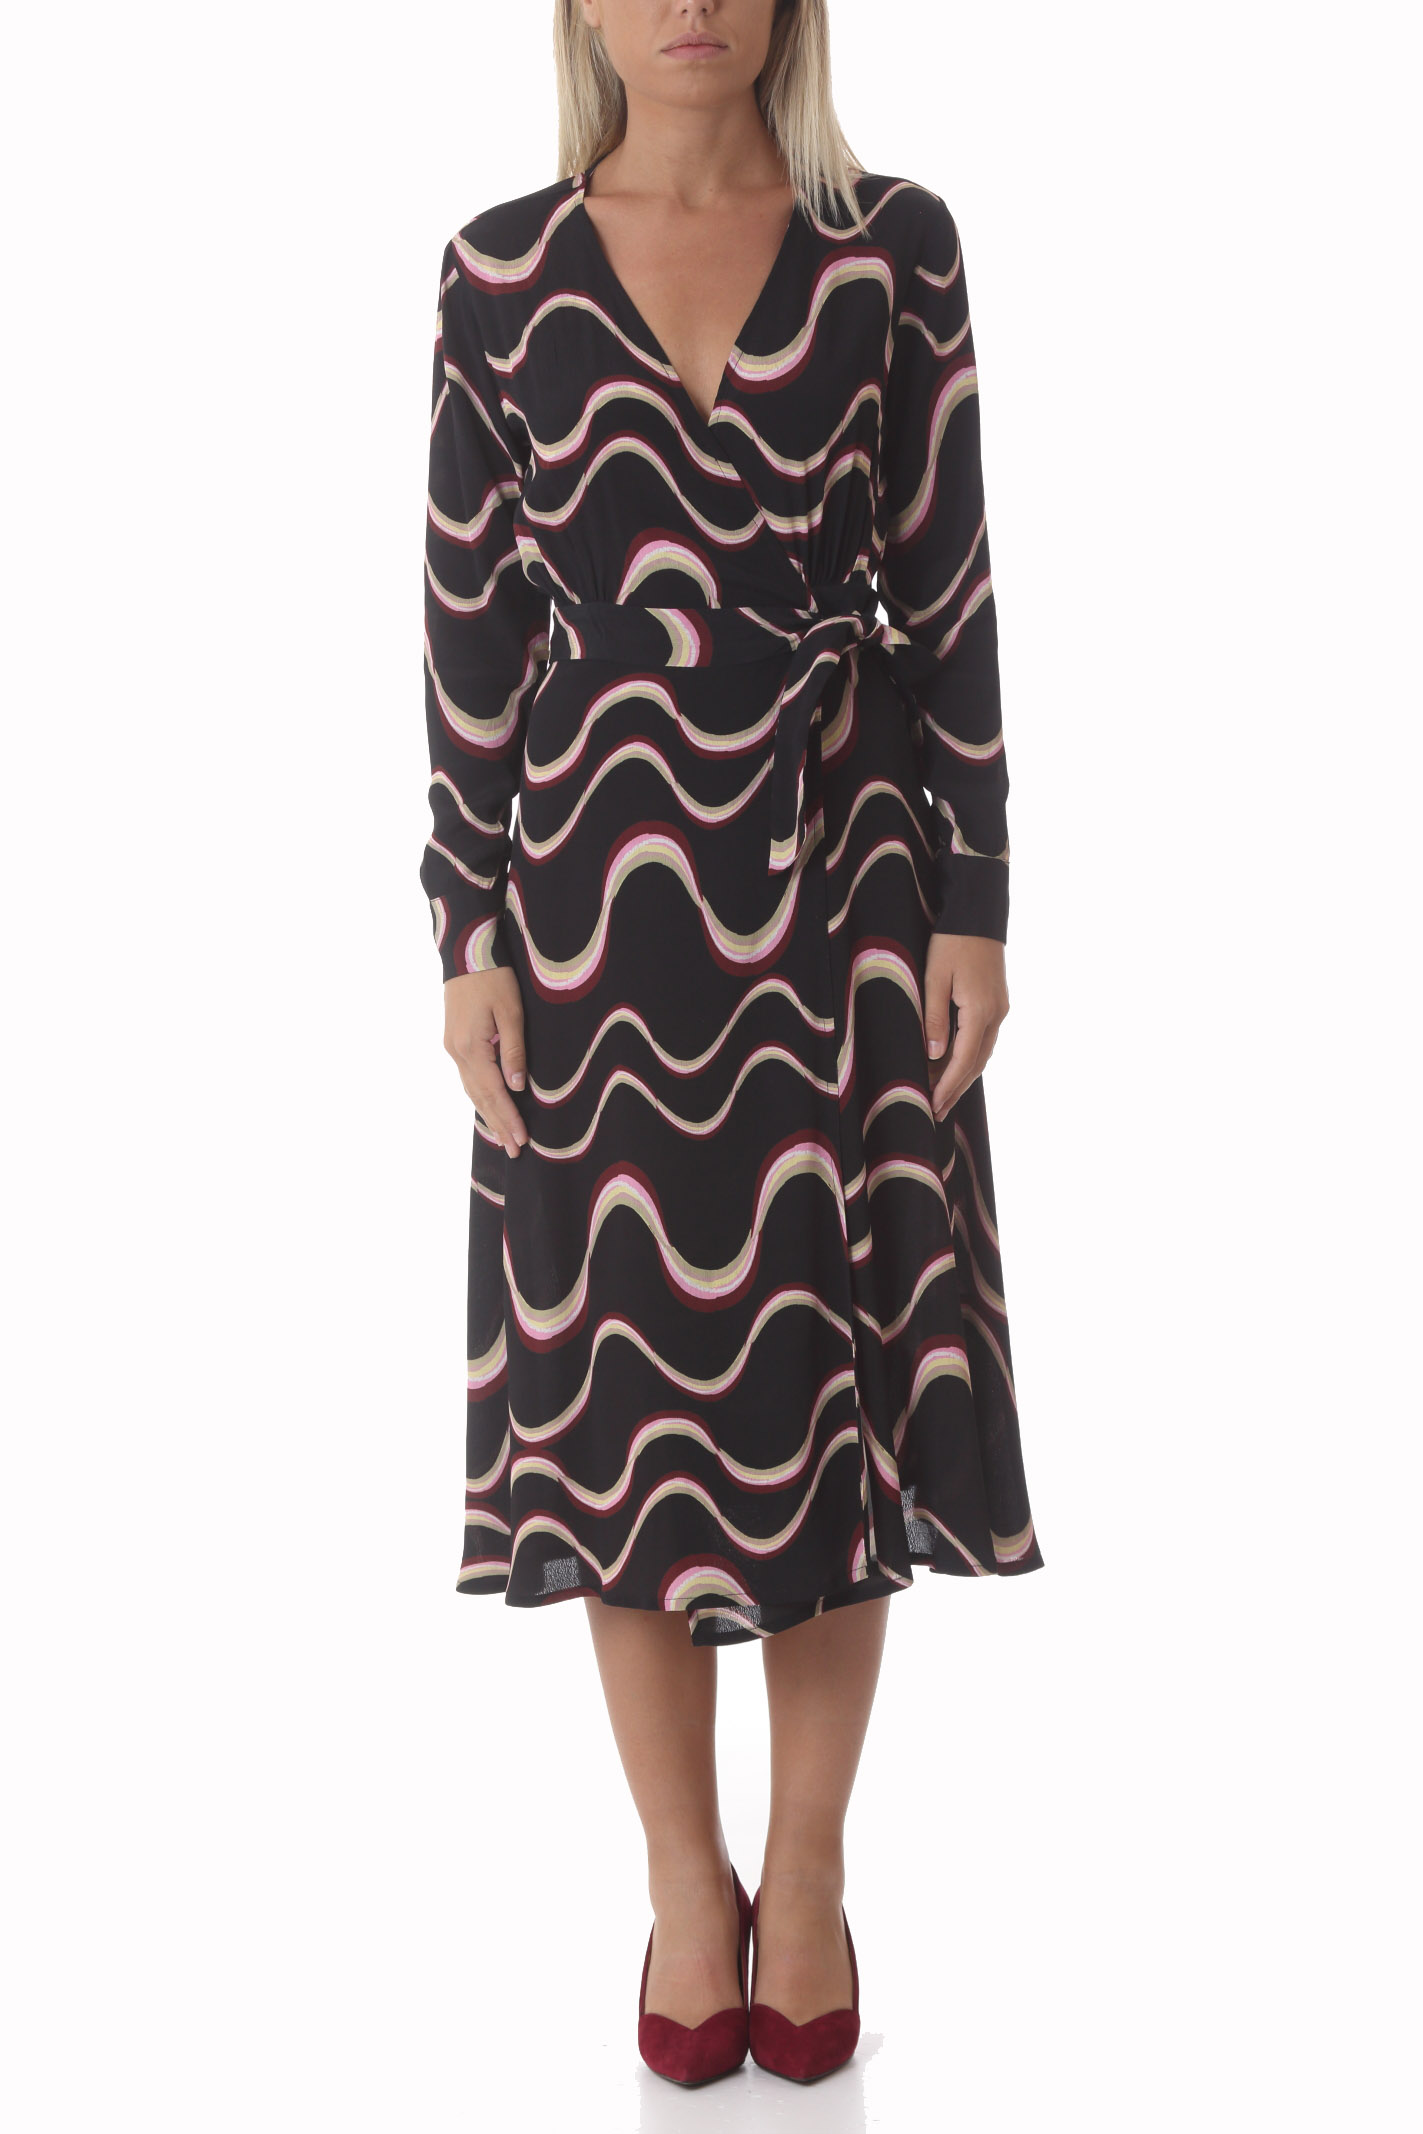 Bernadette dress ATTIC AND BARN | Abiti | A21-ATDR026-AT229905